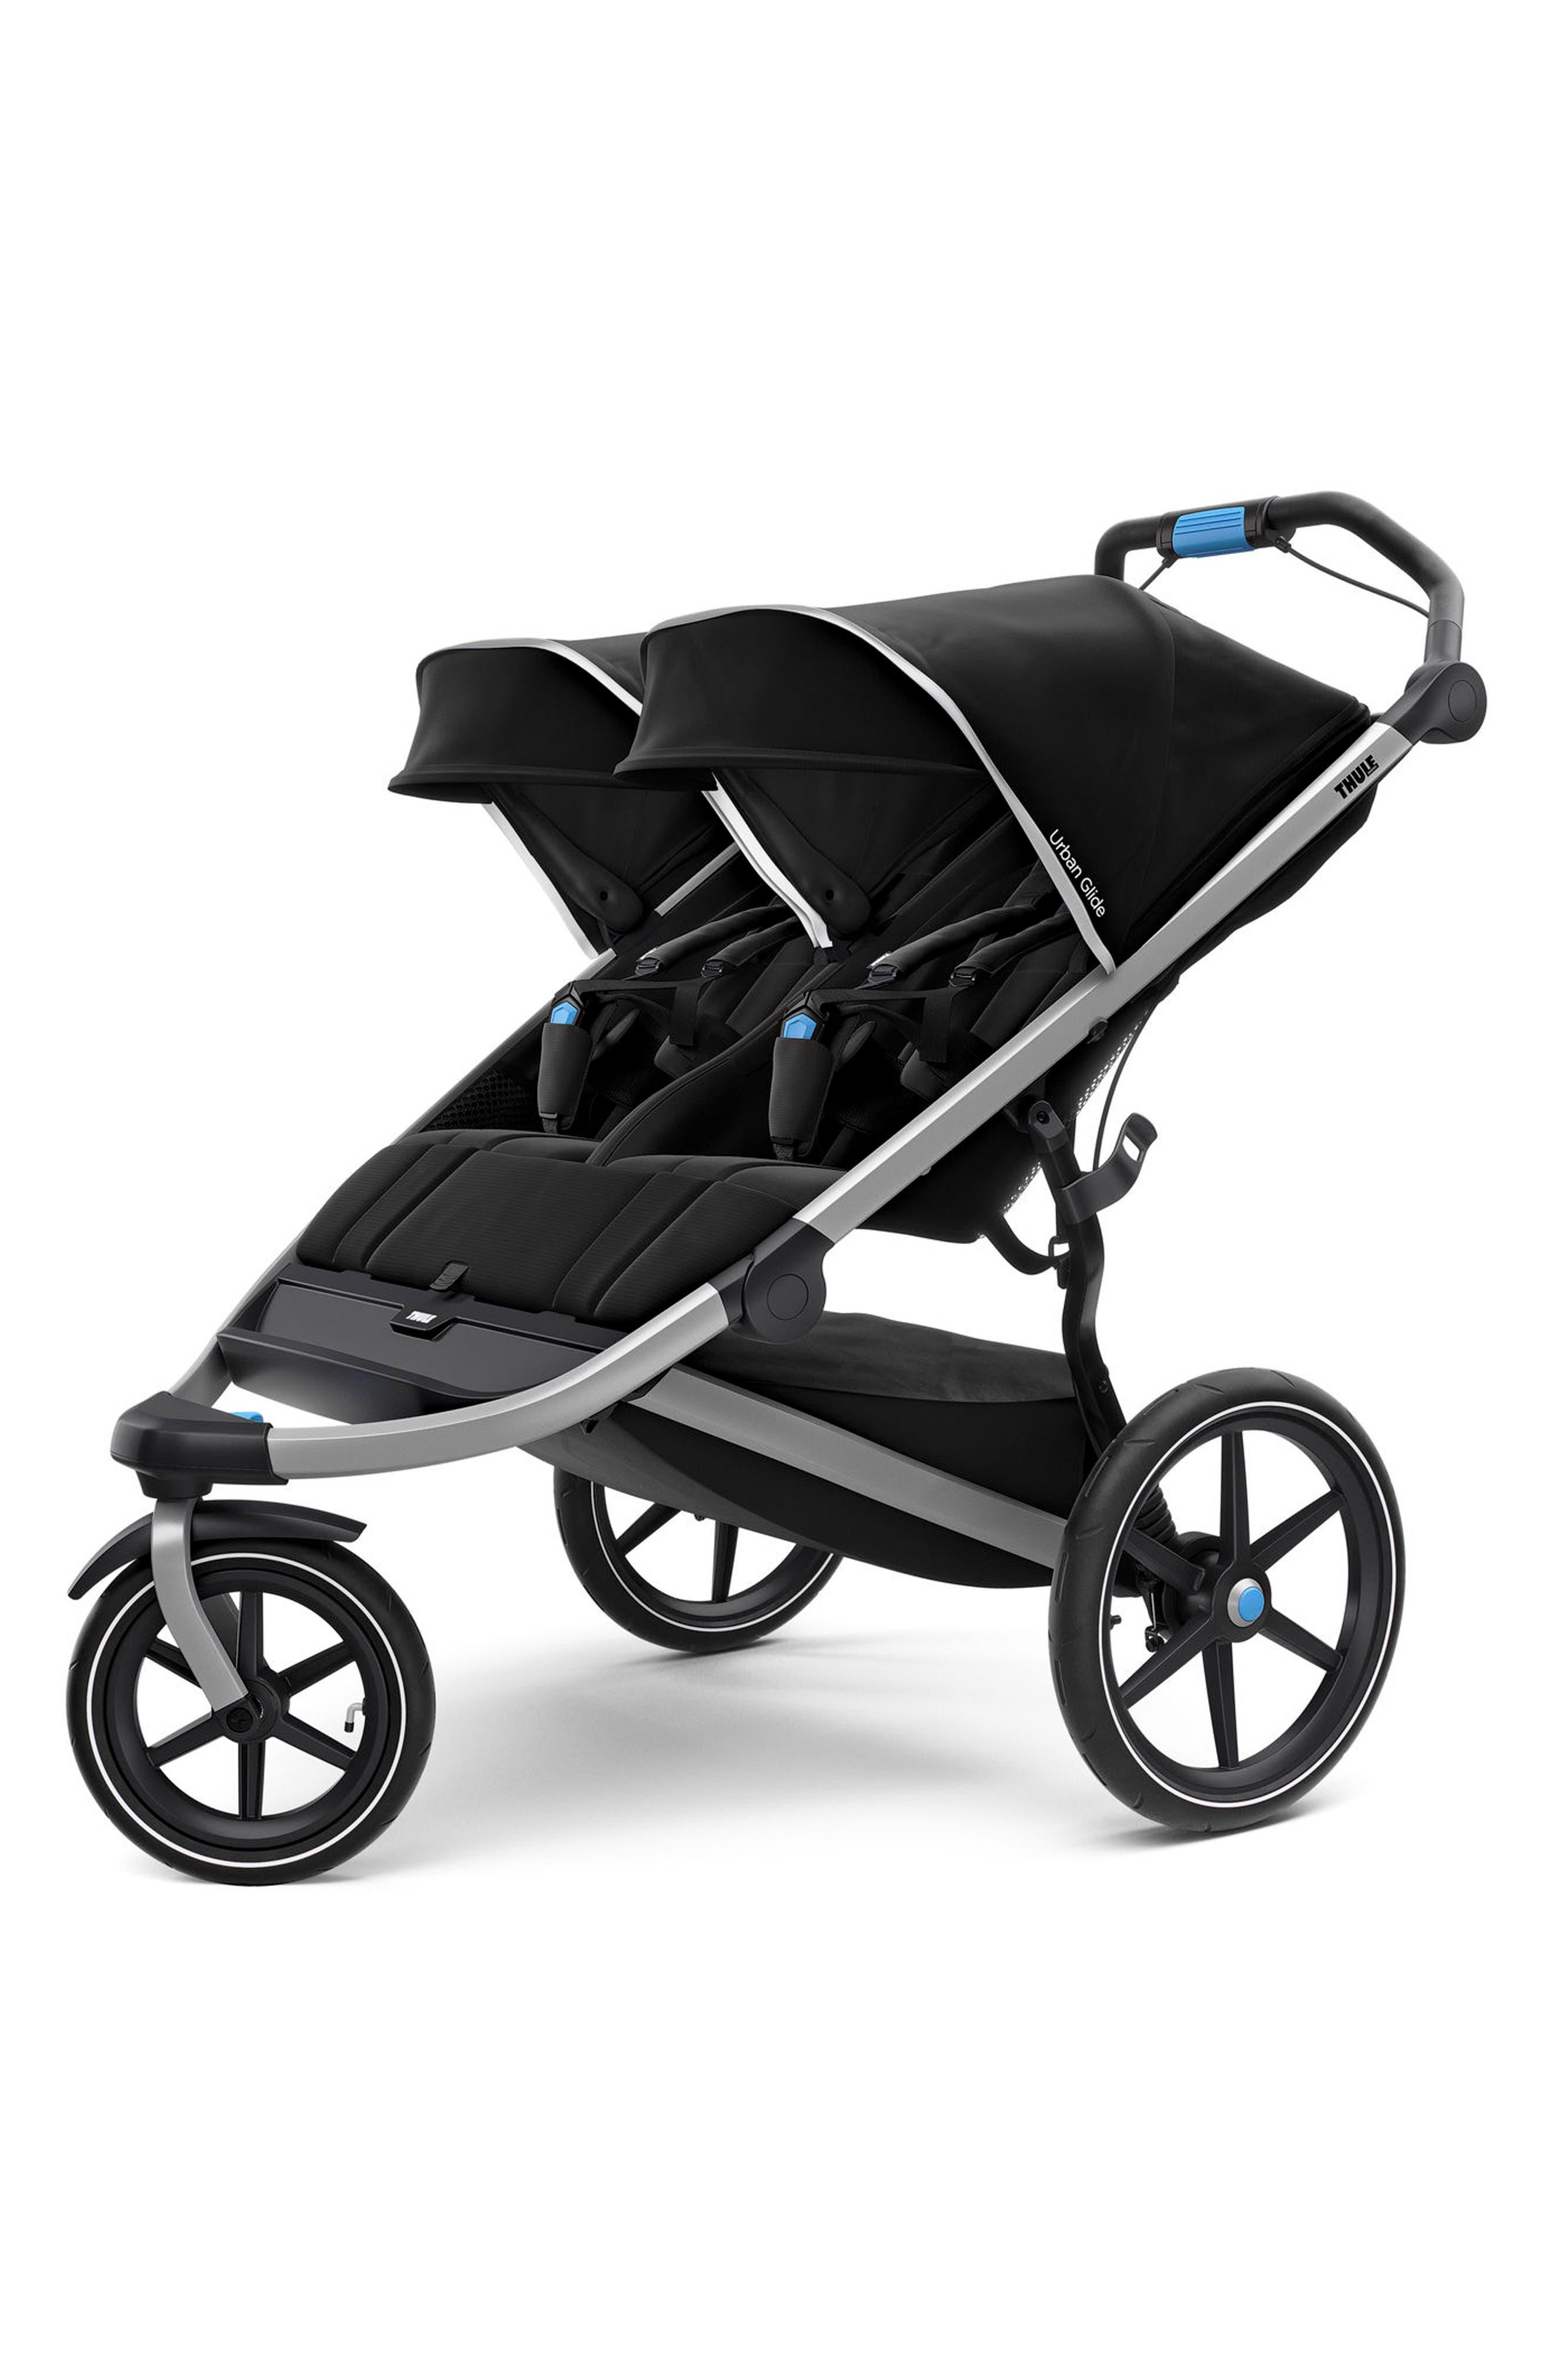 Urban Glide 2 Double Jogging Stroller,                         Main,                         color, BLACK/ SILVER FRAME